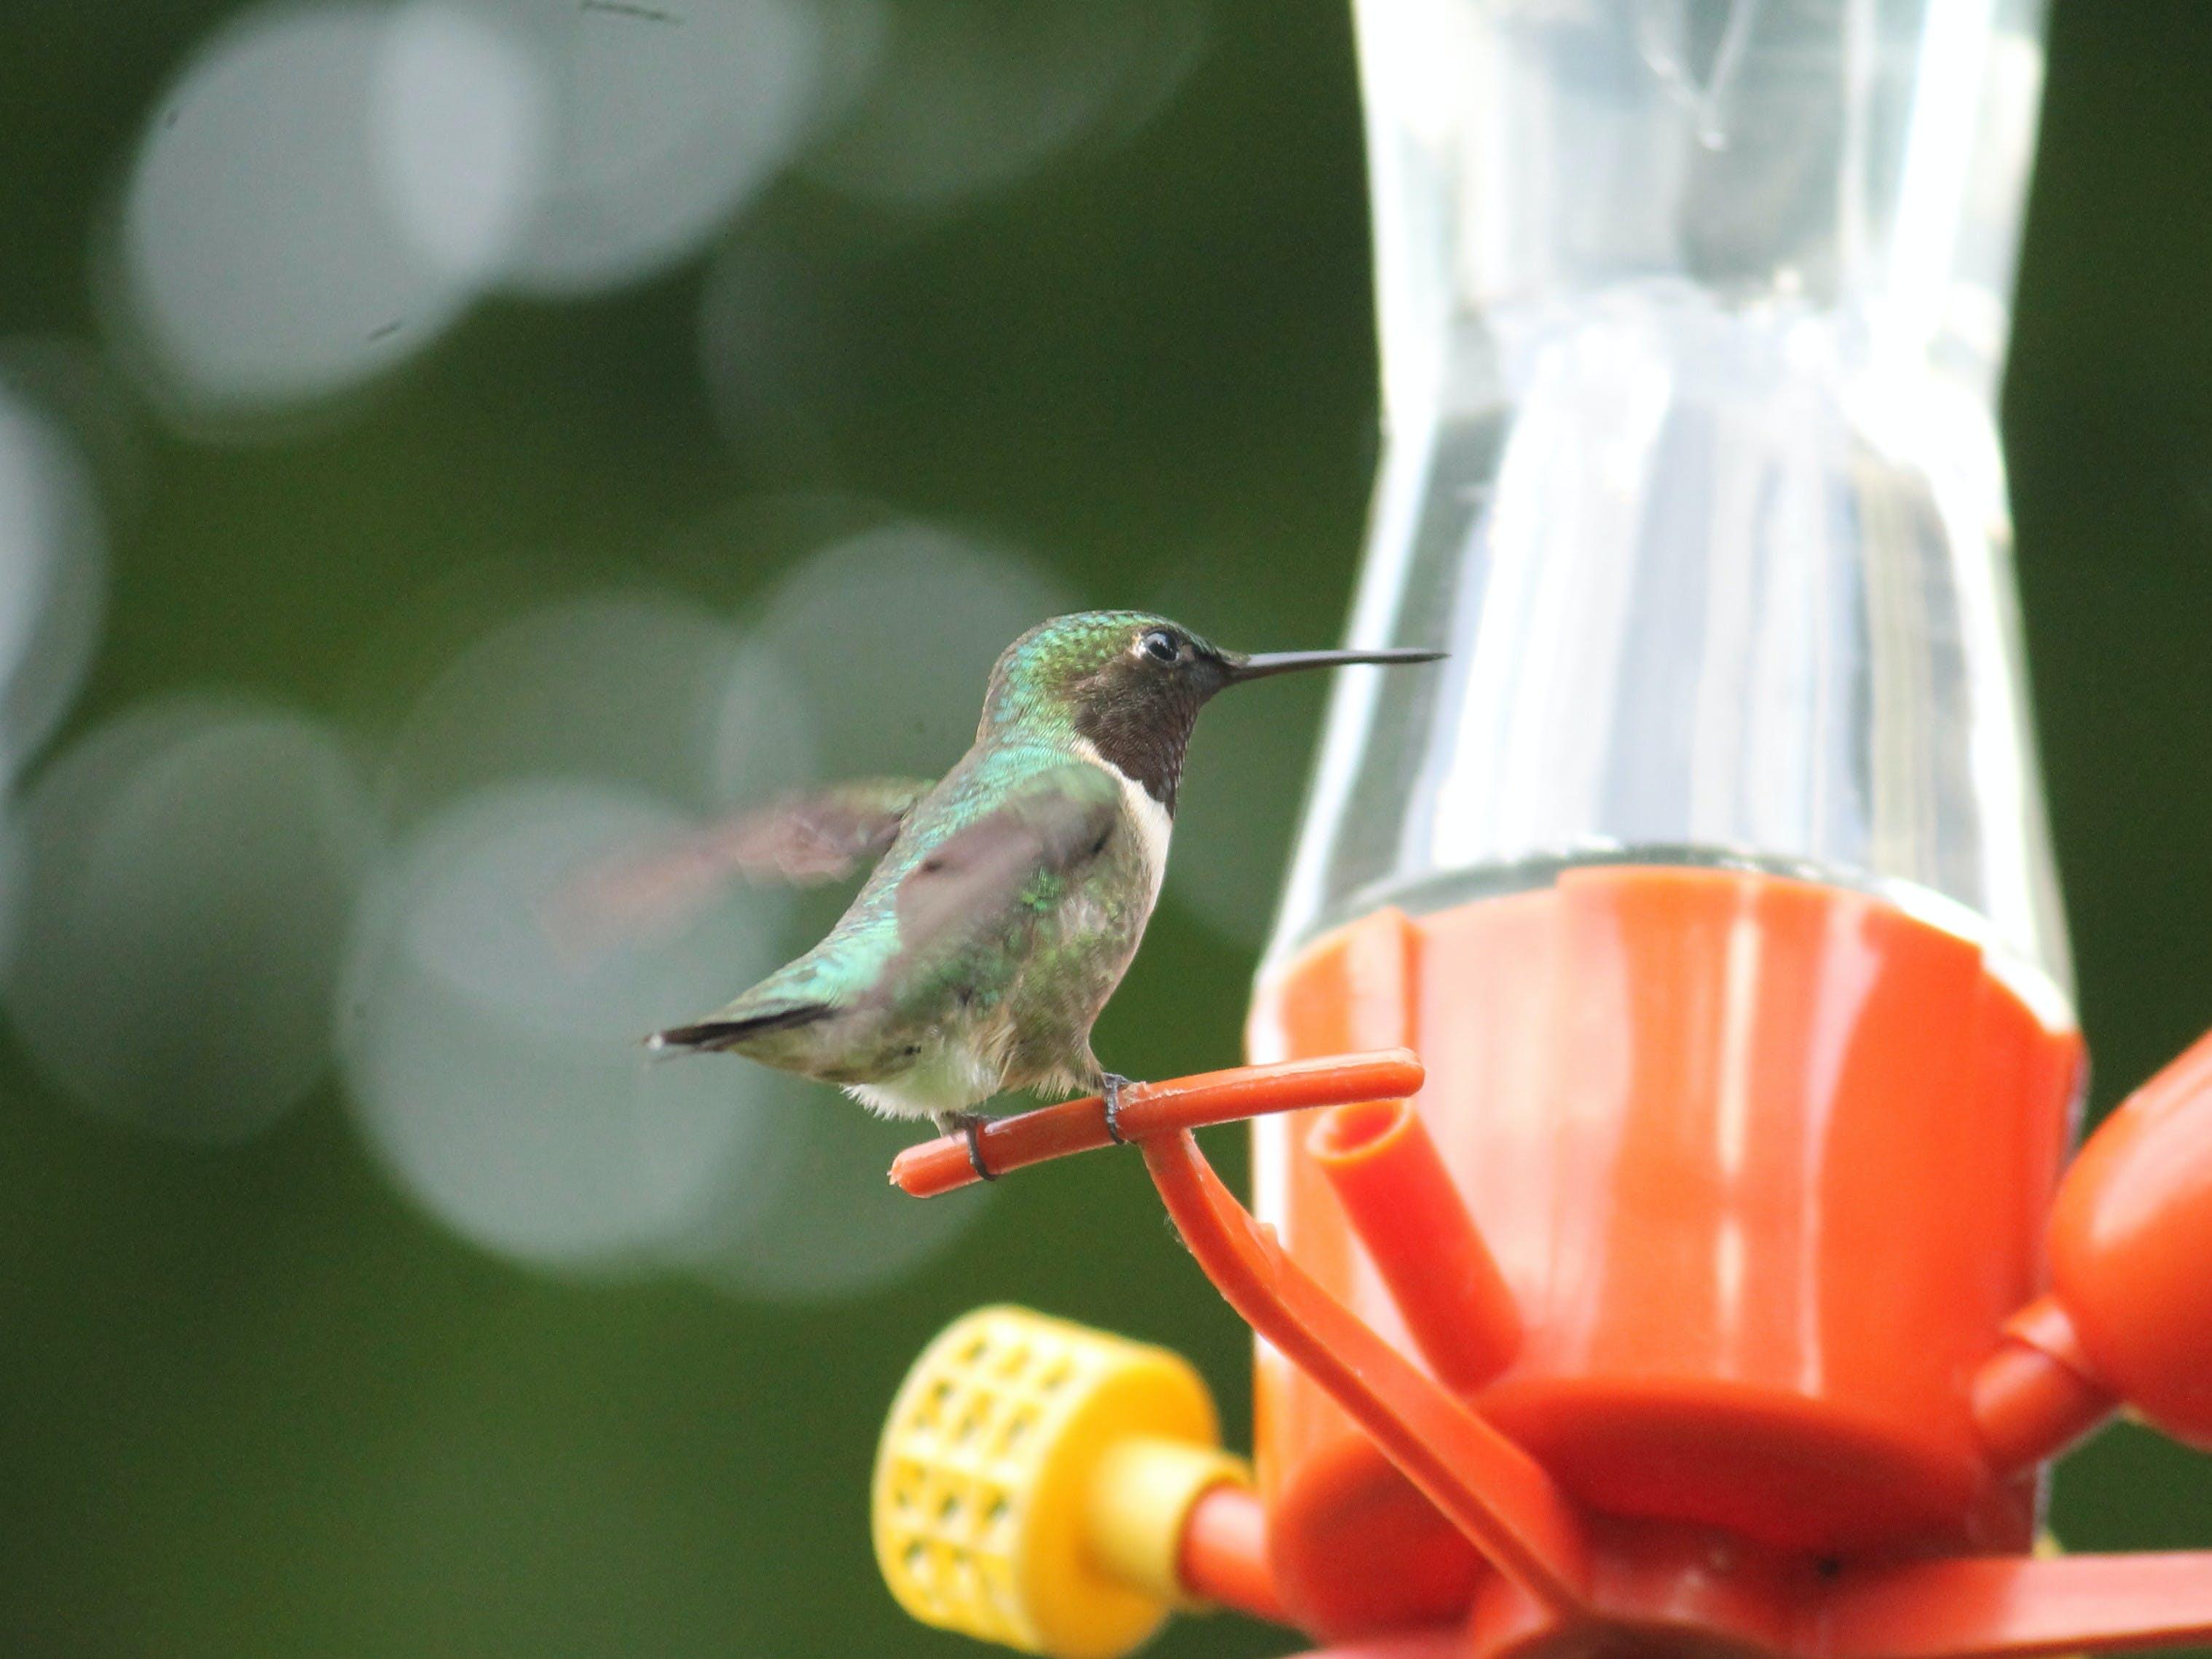 Free stock photo of #bird, hummingbird, nature photography, summer